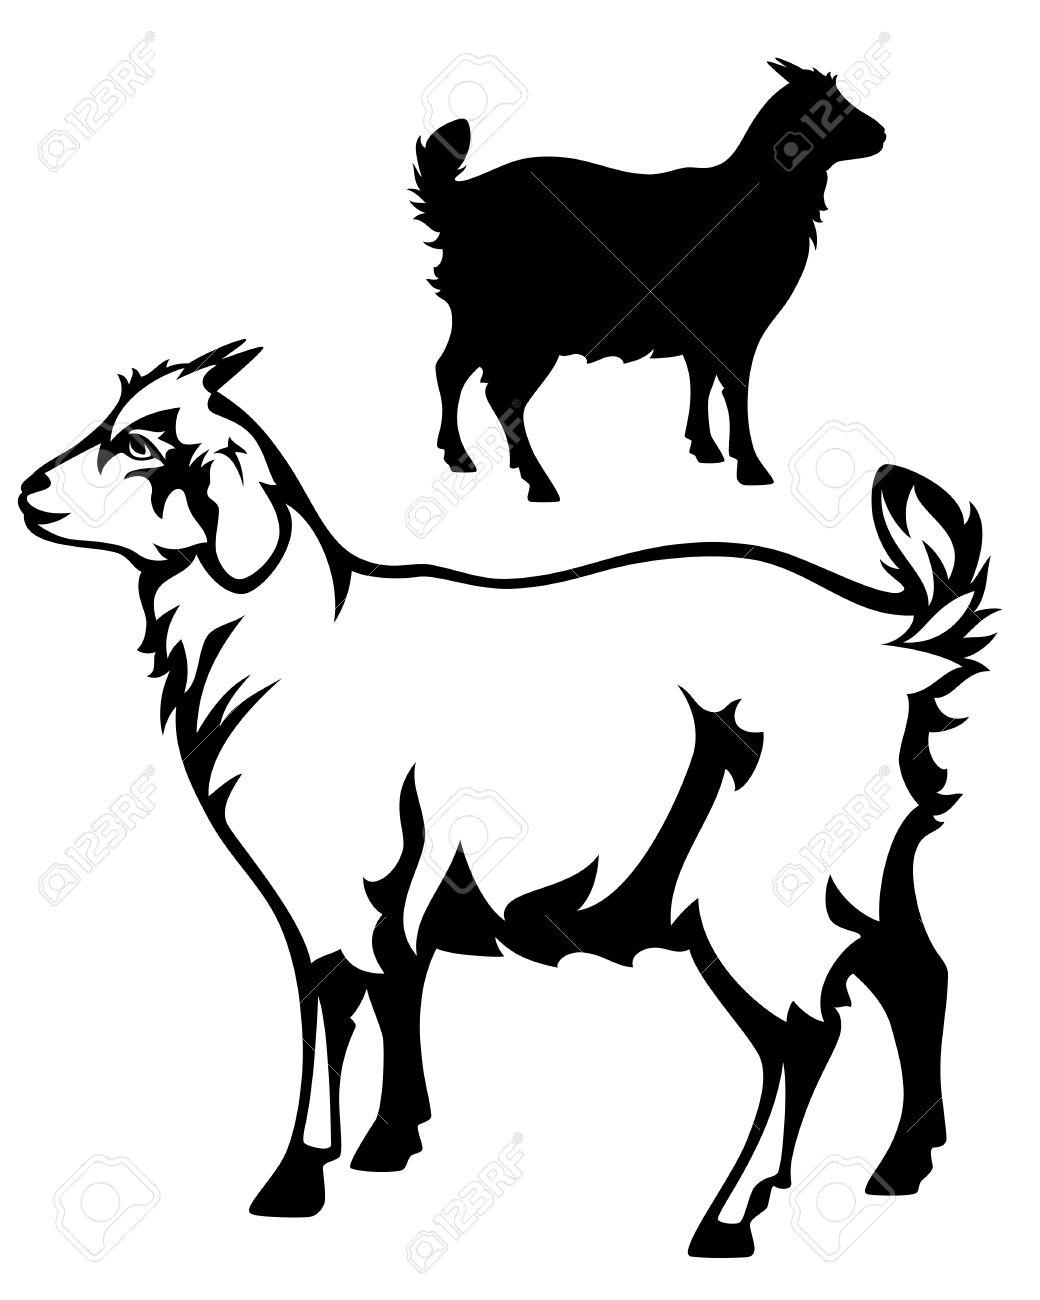 1040x1300 Nature Goat Clipart, Explore Pictures